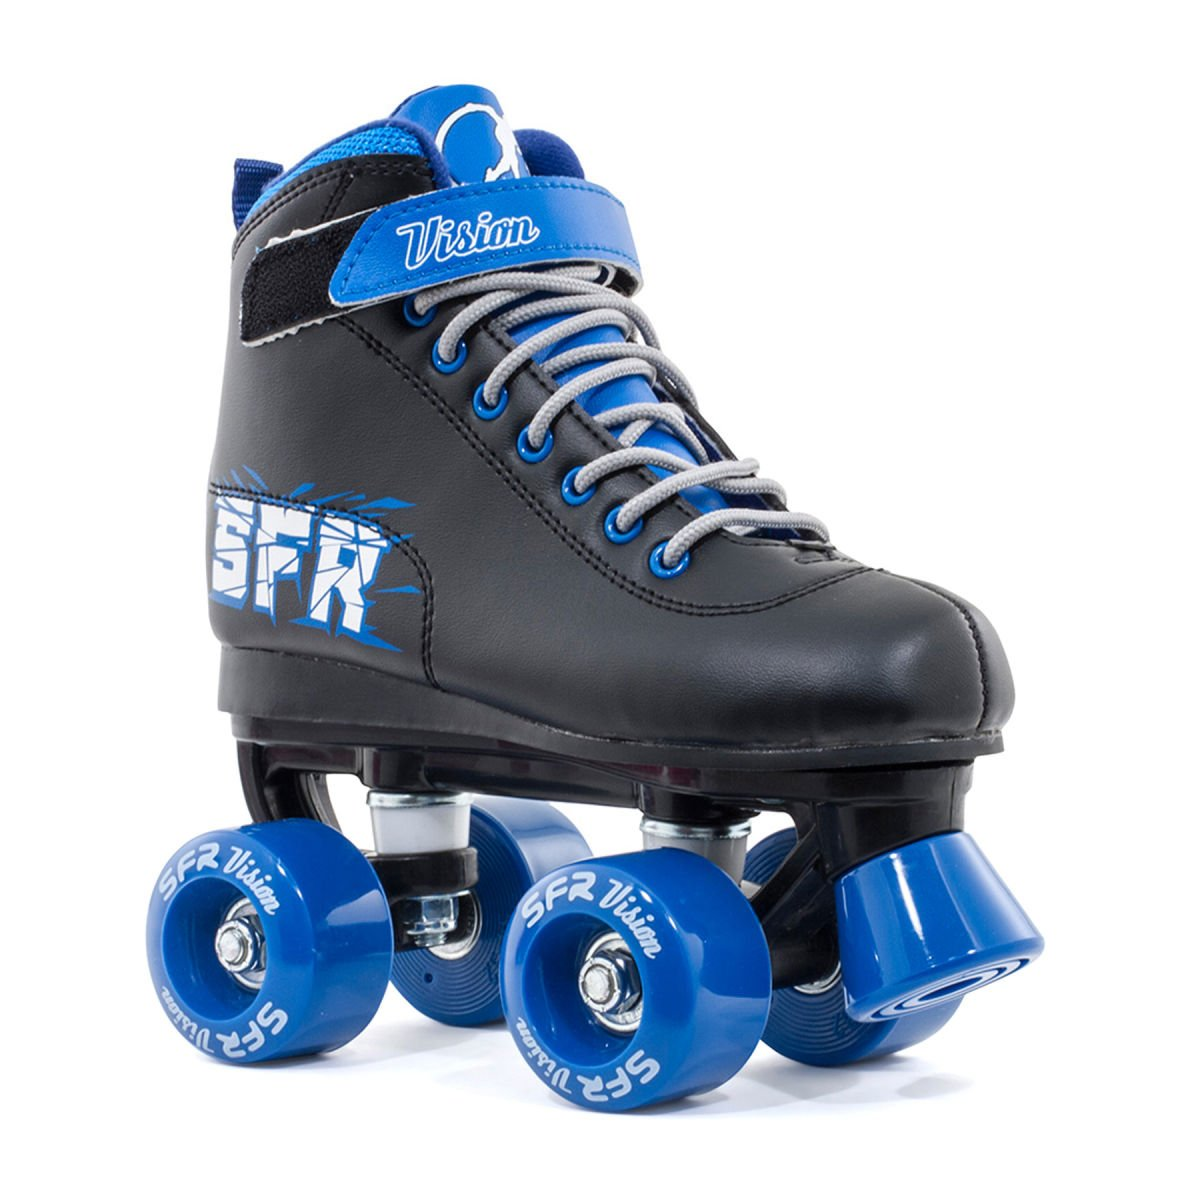 SFR Skates Vision II Patines, Unisex niños RS239